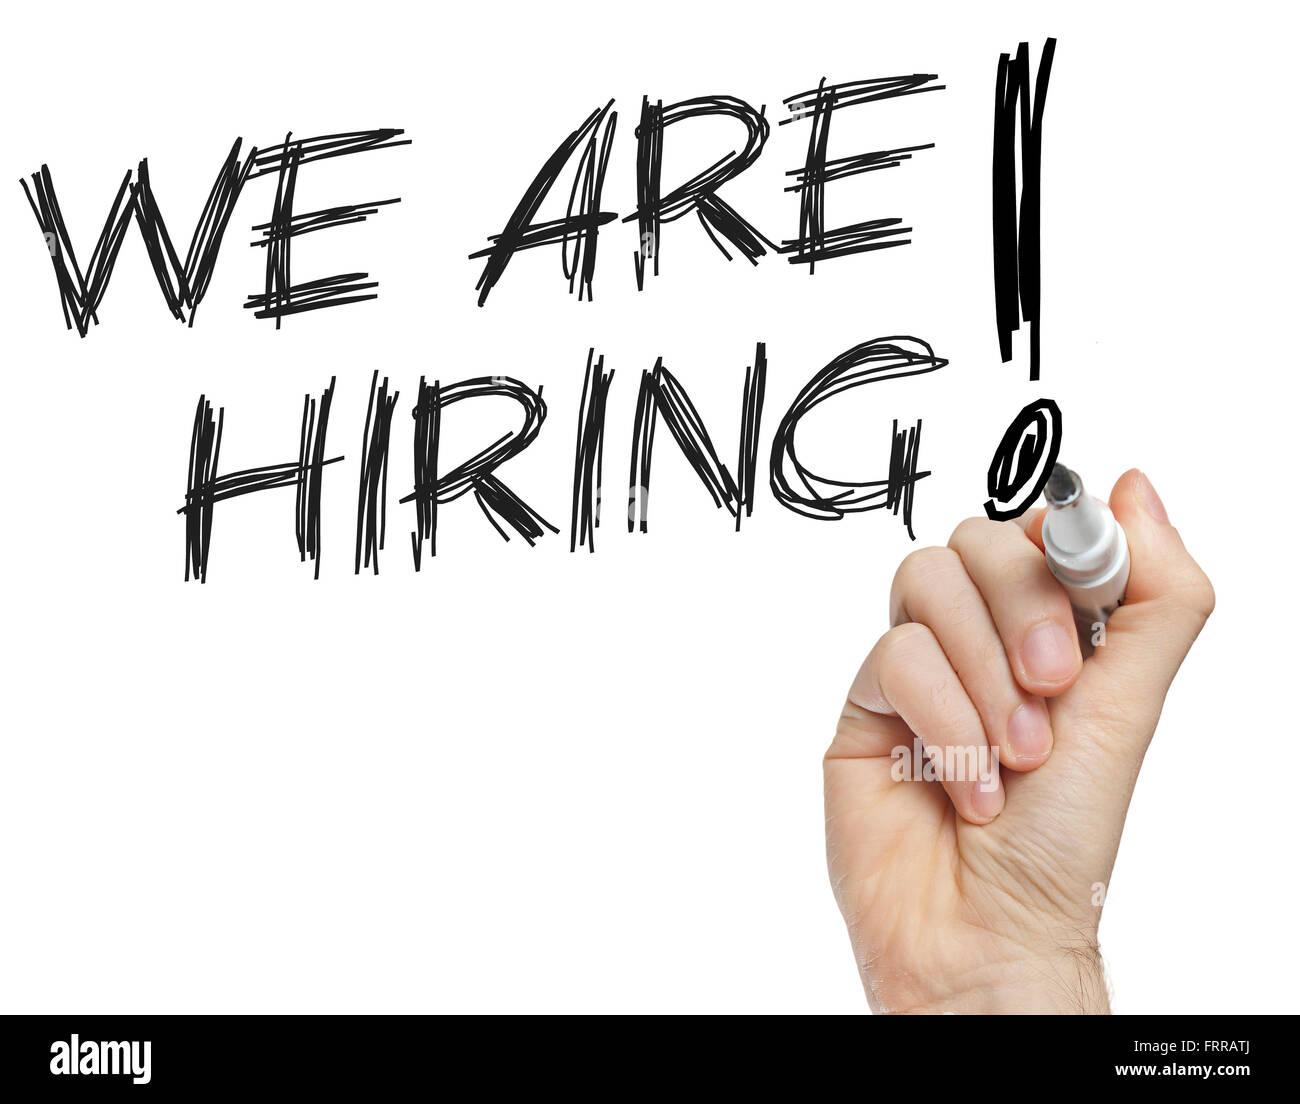 We're hiring advertisement written on whiteboard - Stock Image